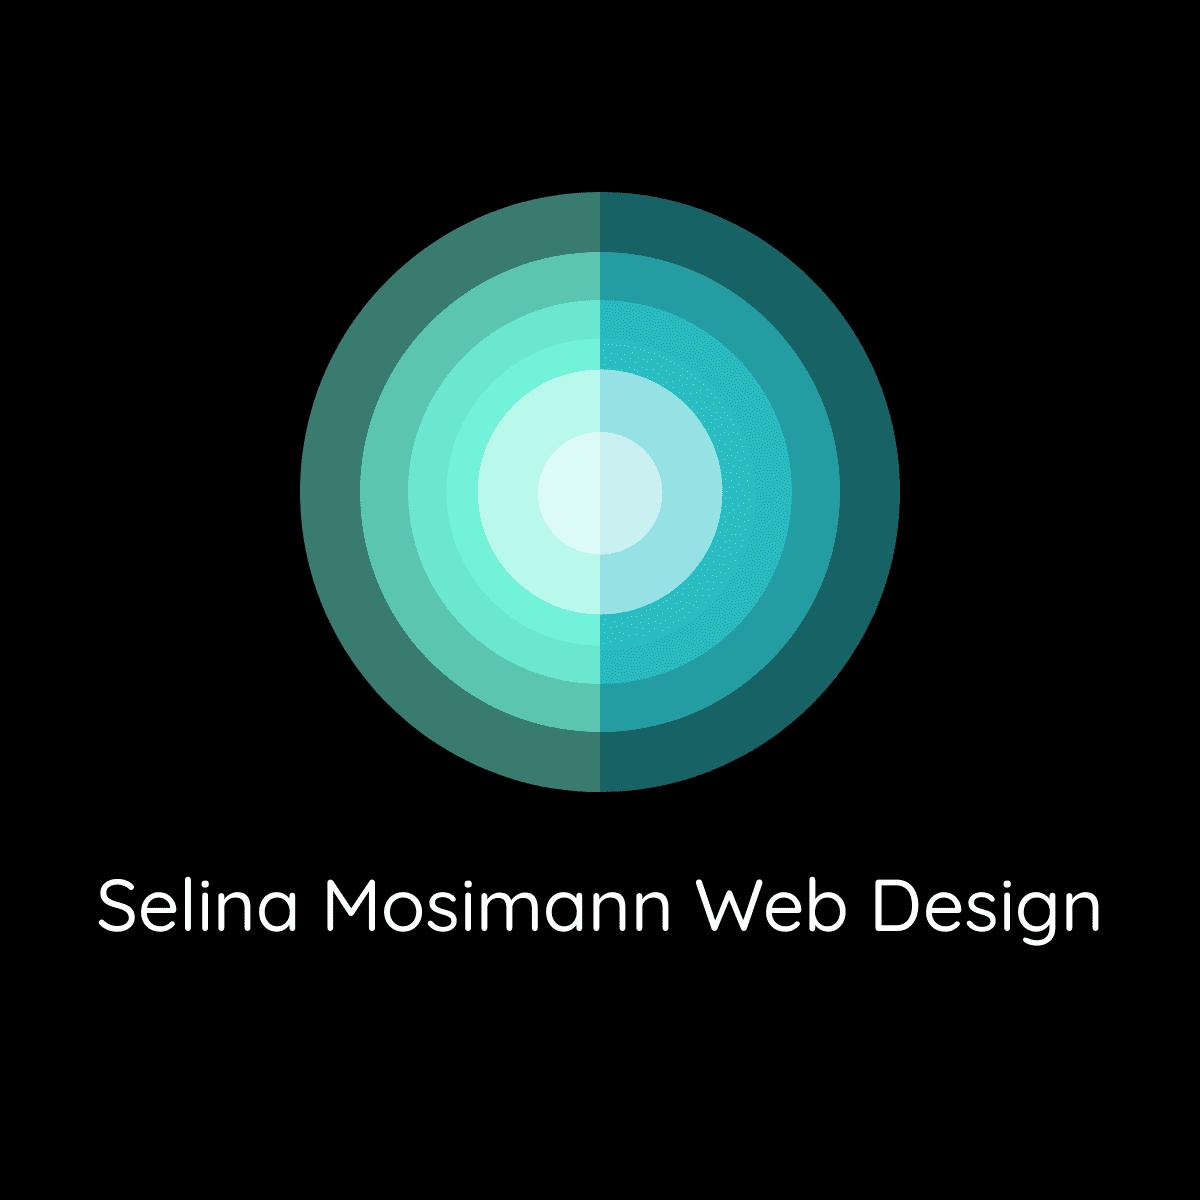 Selina Mosimann Webdesign Logo